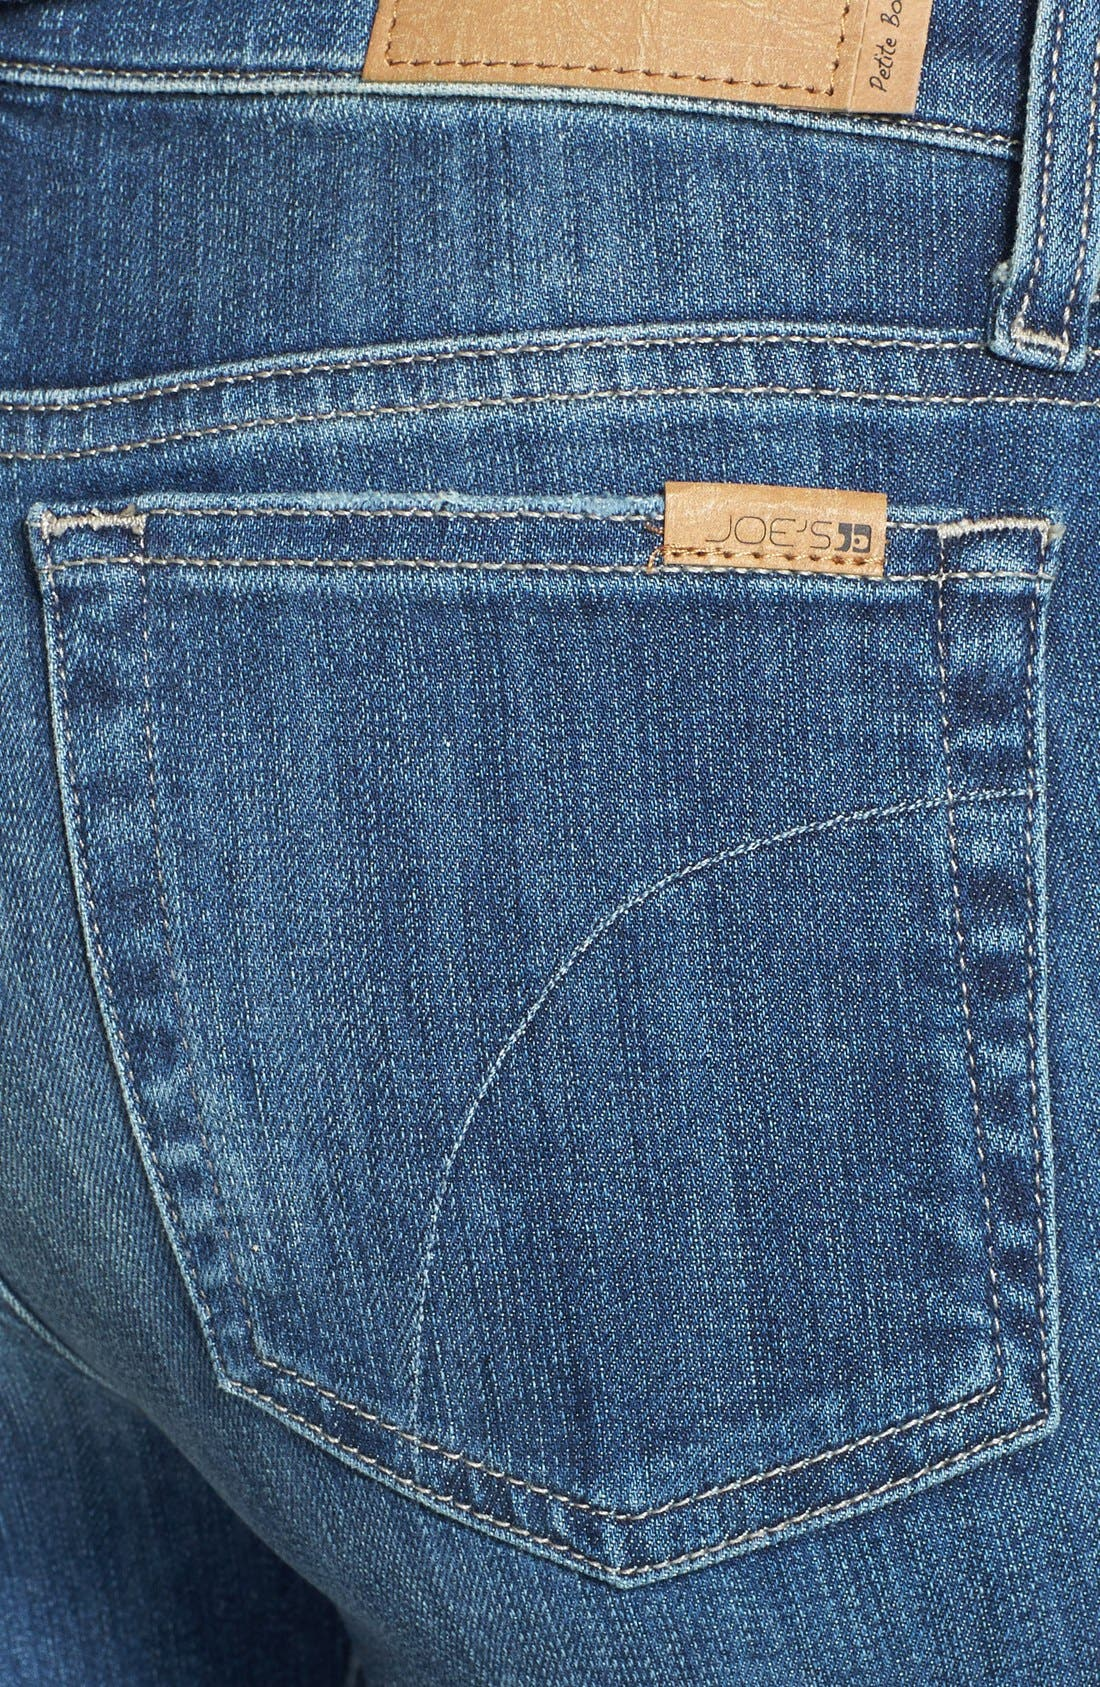 Bootcut Jeans,                             Alternate thumbnail 3, color,